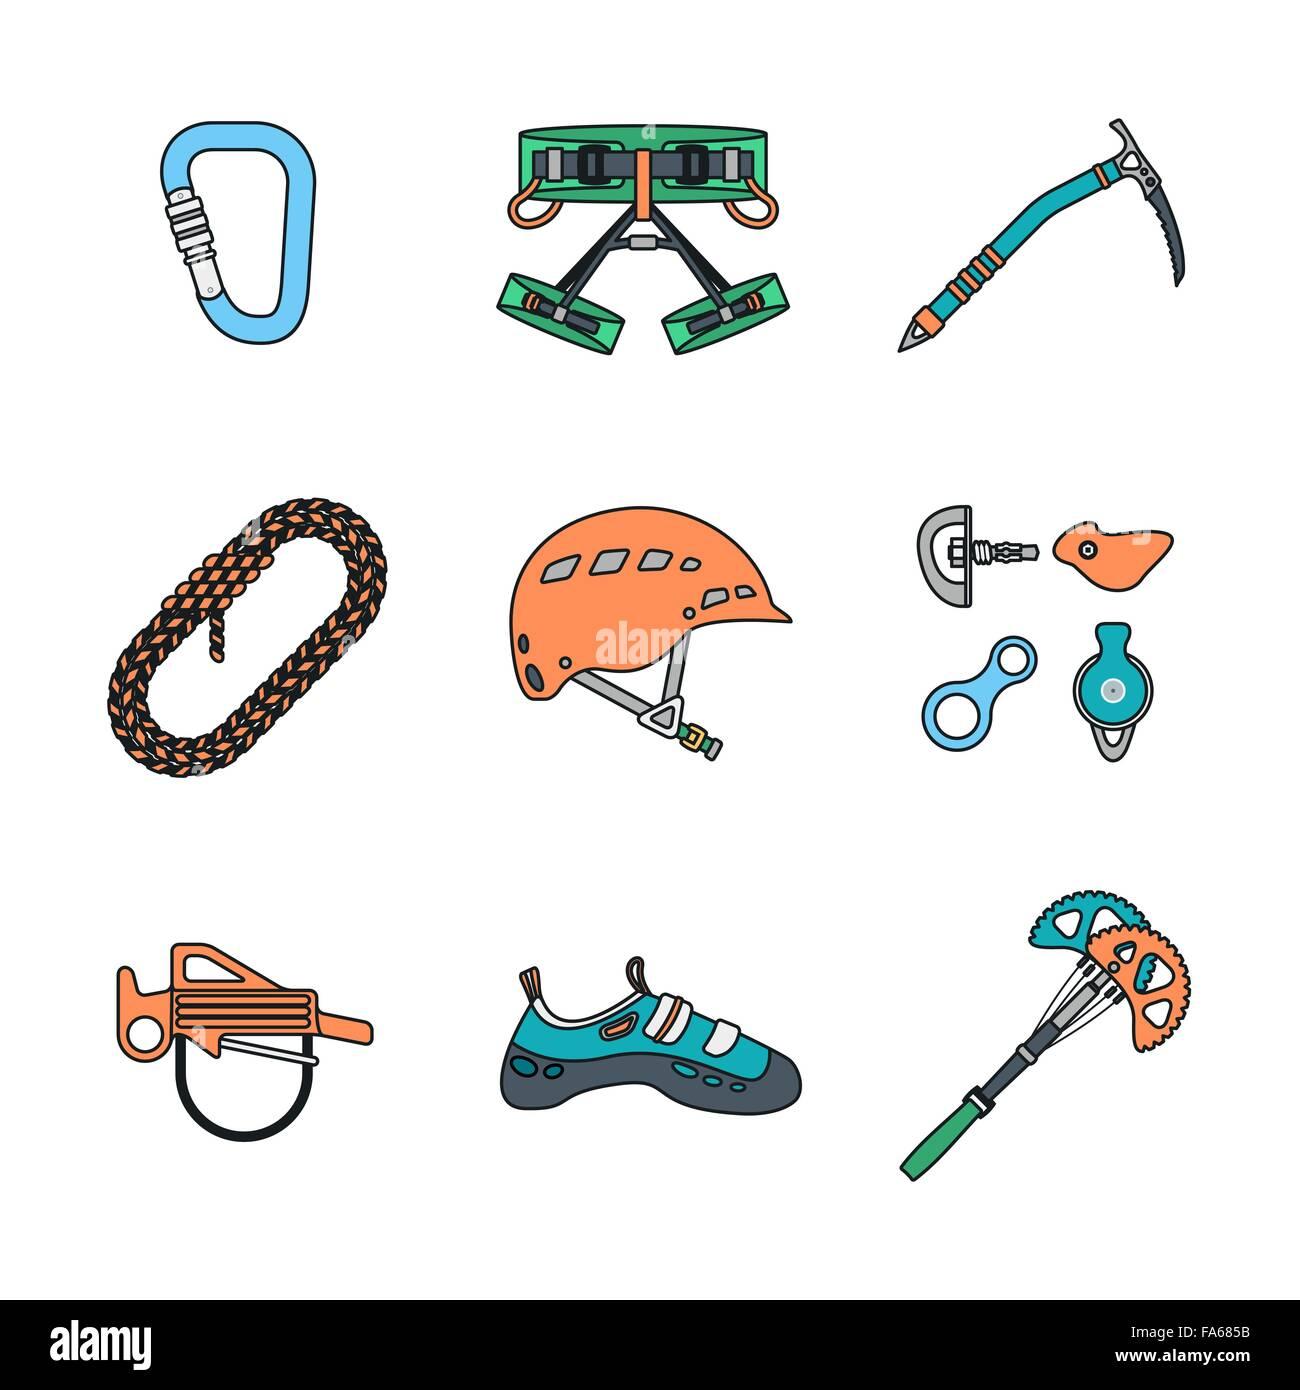 Vector Colored Outline Various Climbing Gear Carabiner Harness Helmet Stock Vector Image Art Alamy